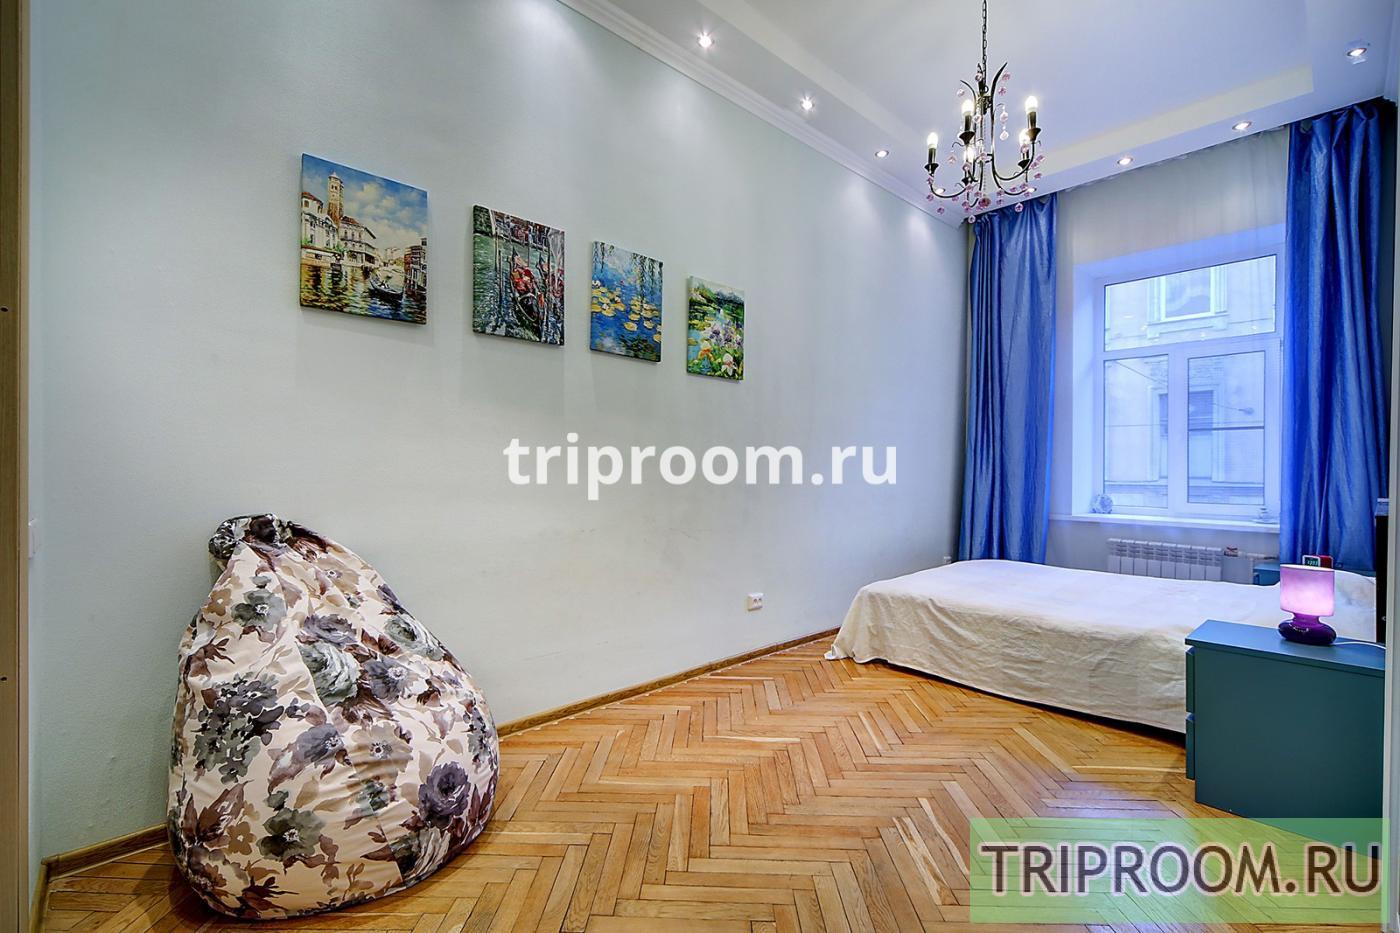 2-комнатная квартира посуточно (вариант № 15426), ул. Лиговский проспект, фото № 14